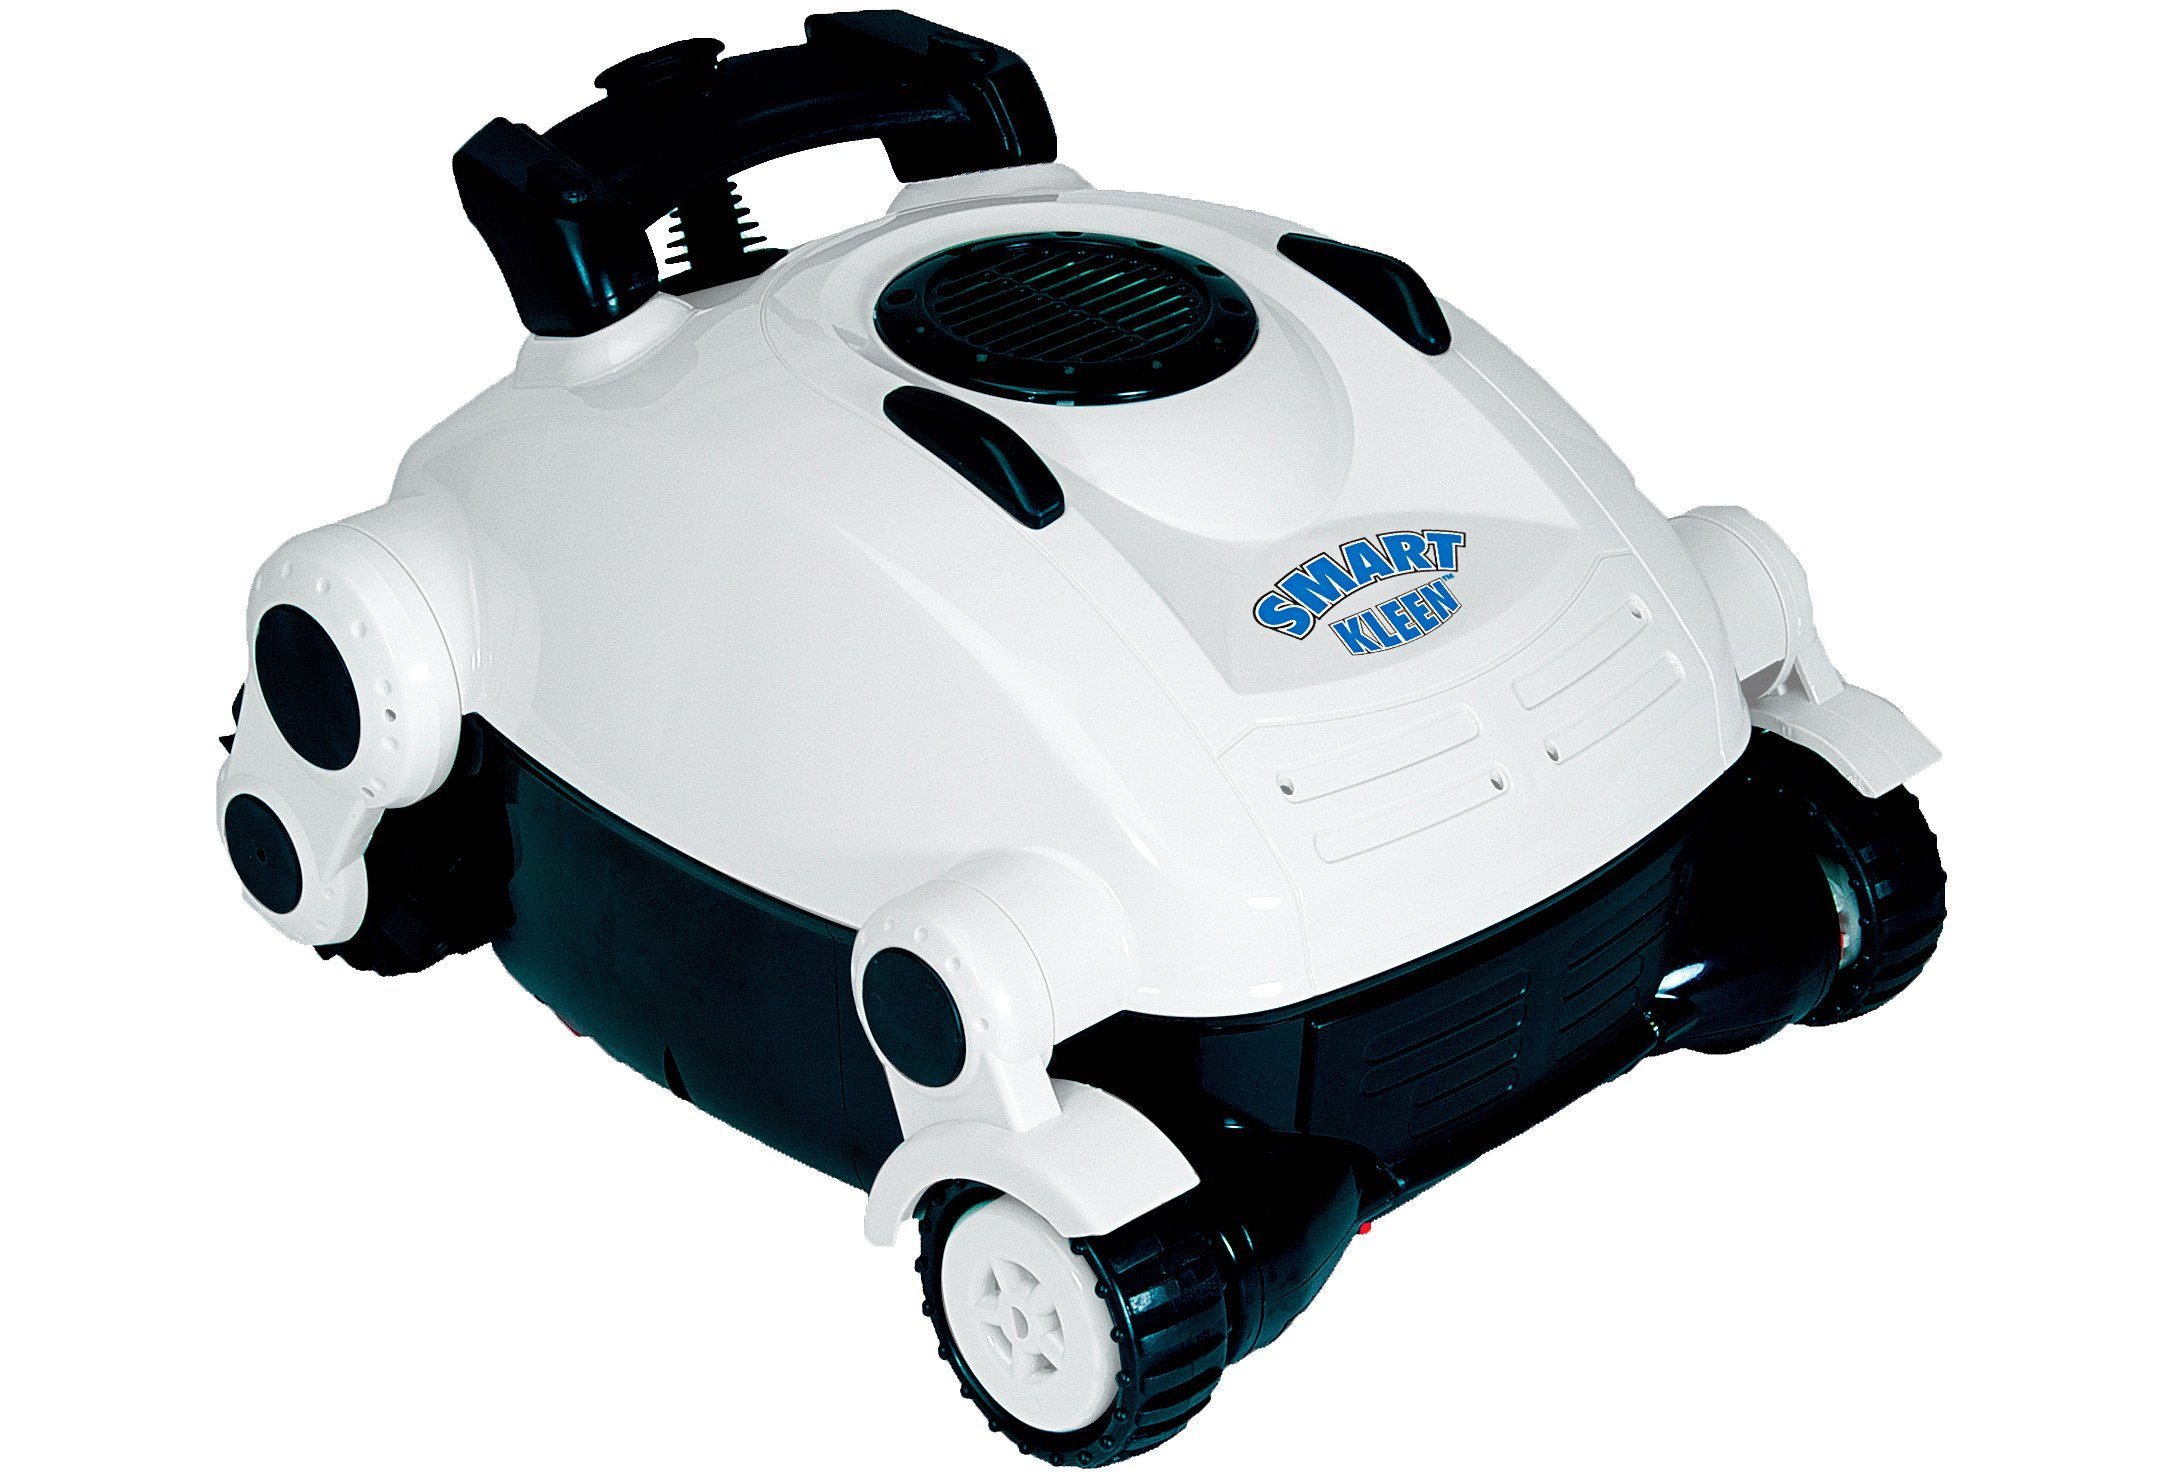 Clear Pool Automatischer Bodenreiniger »Smart-Kleen«